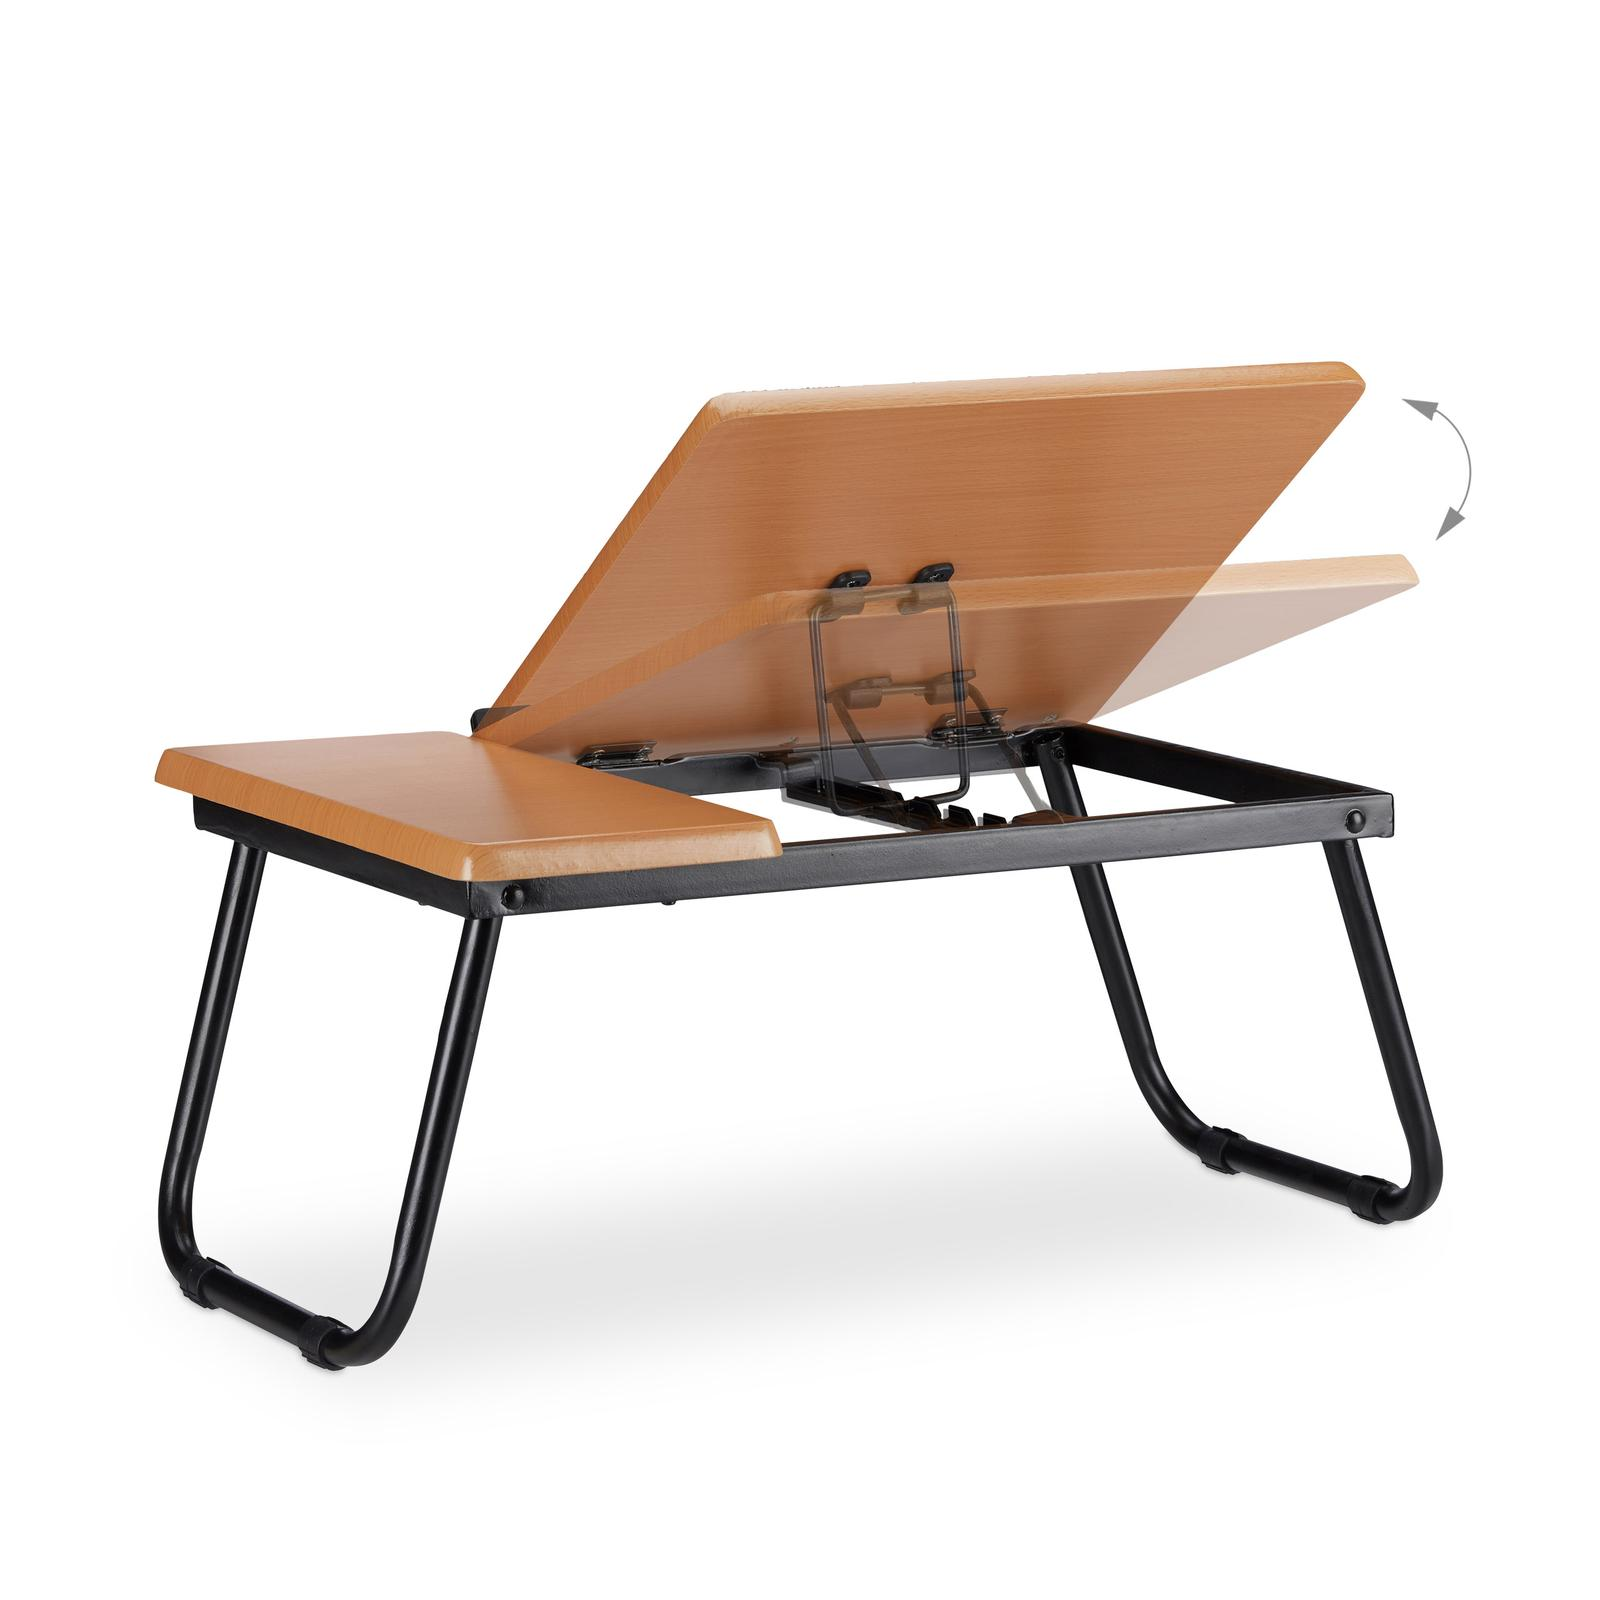 Stolík pre notebook, raňajkové stolíky - Obrázok č. 20